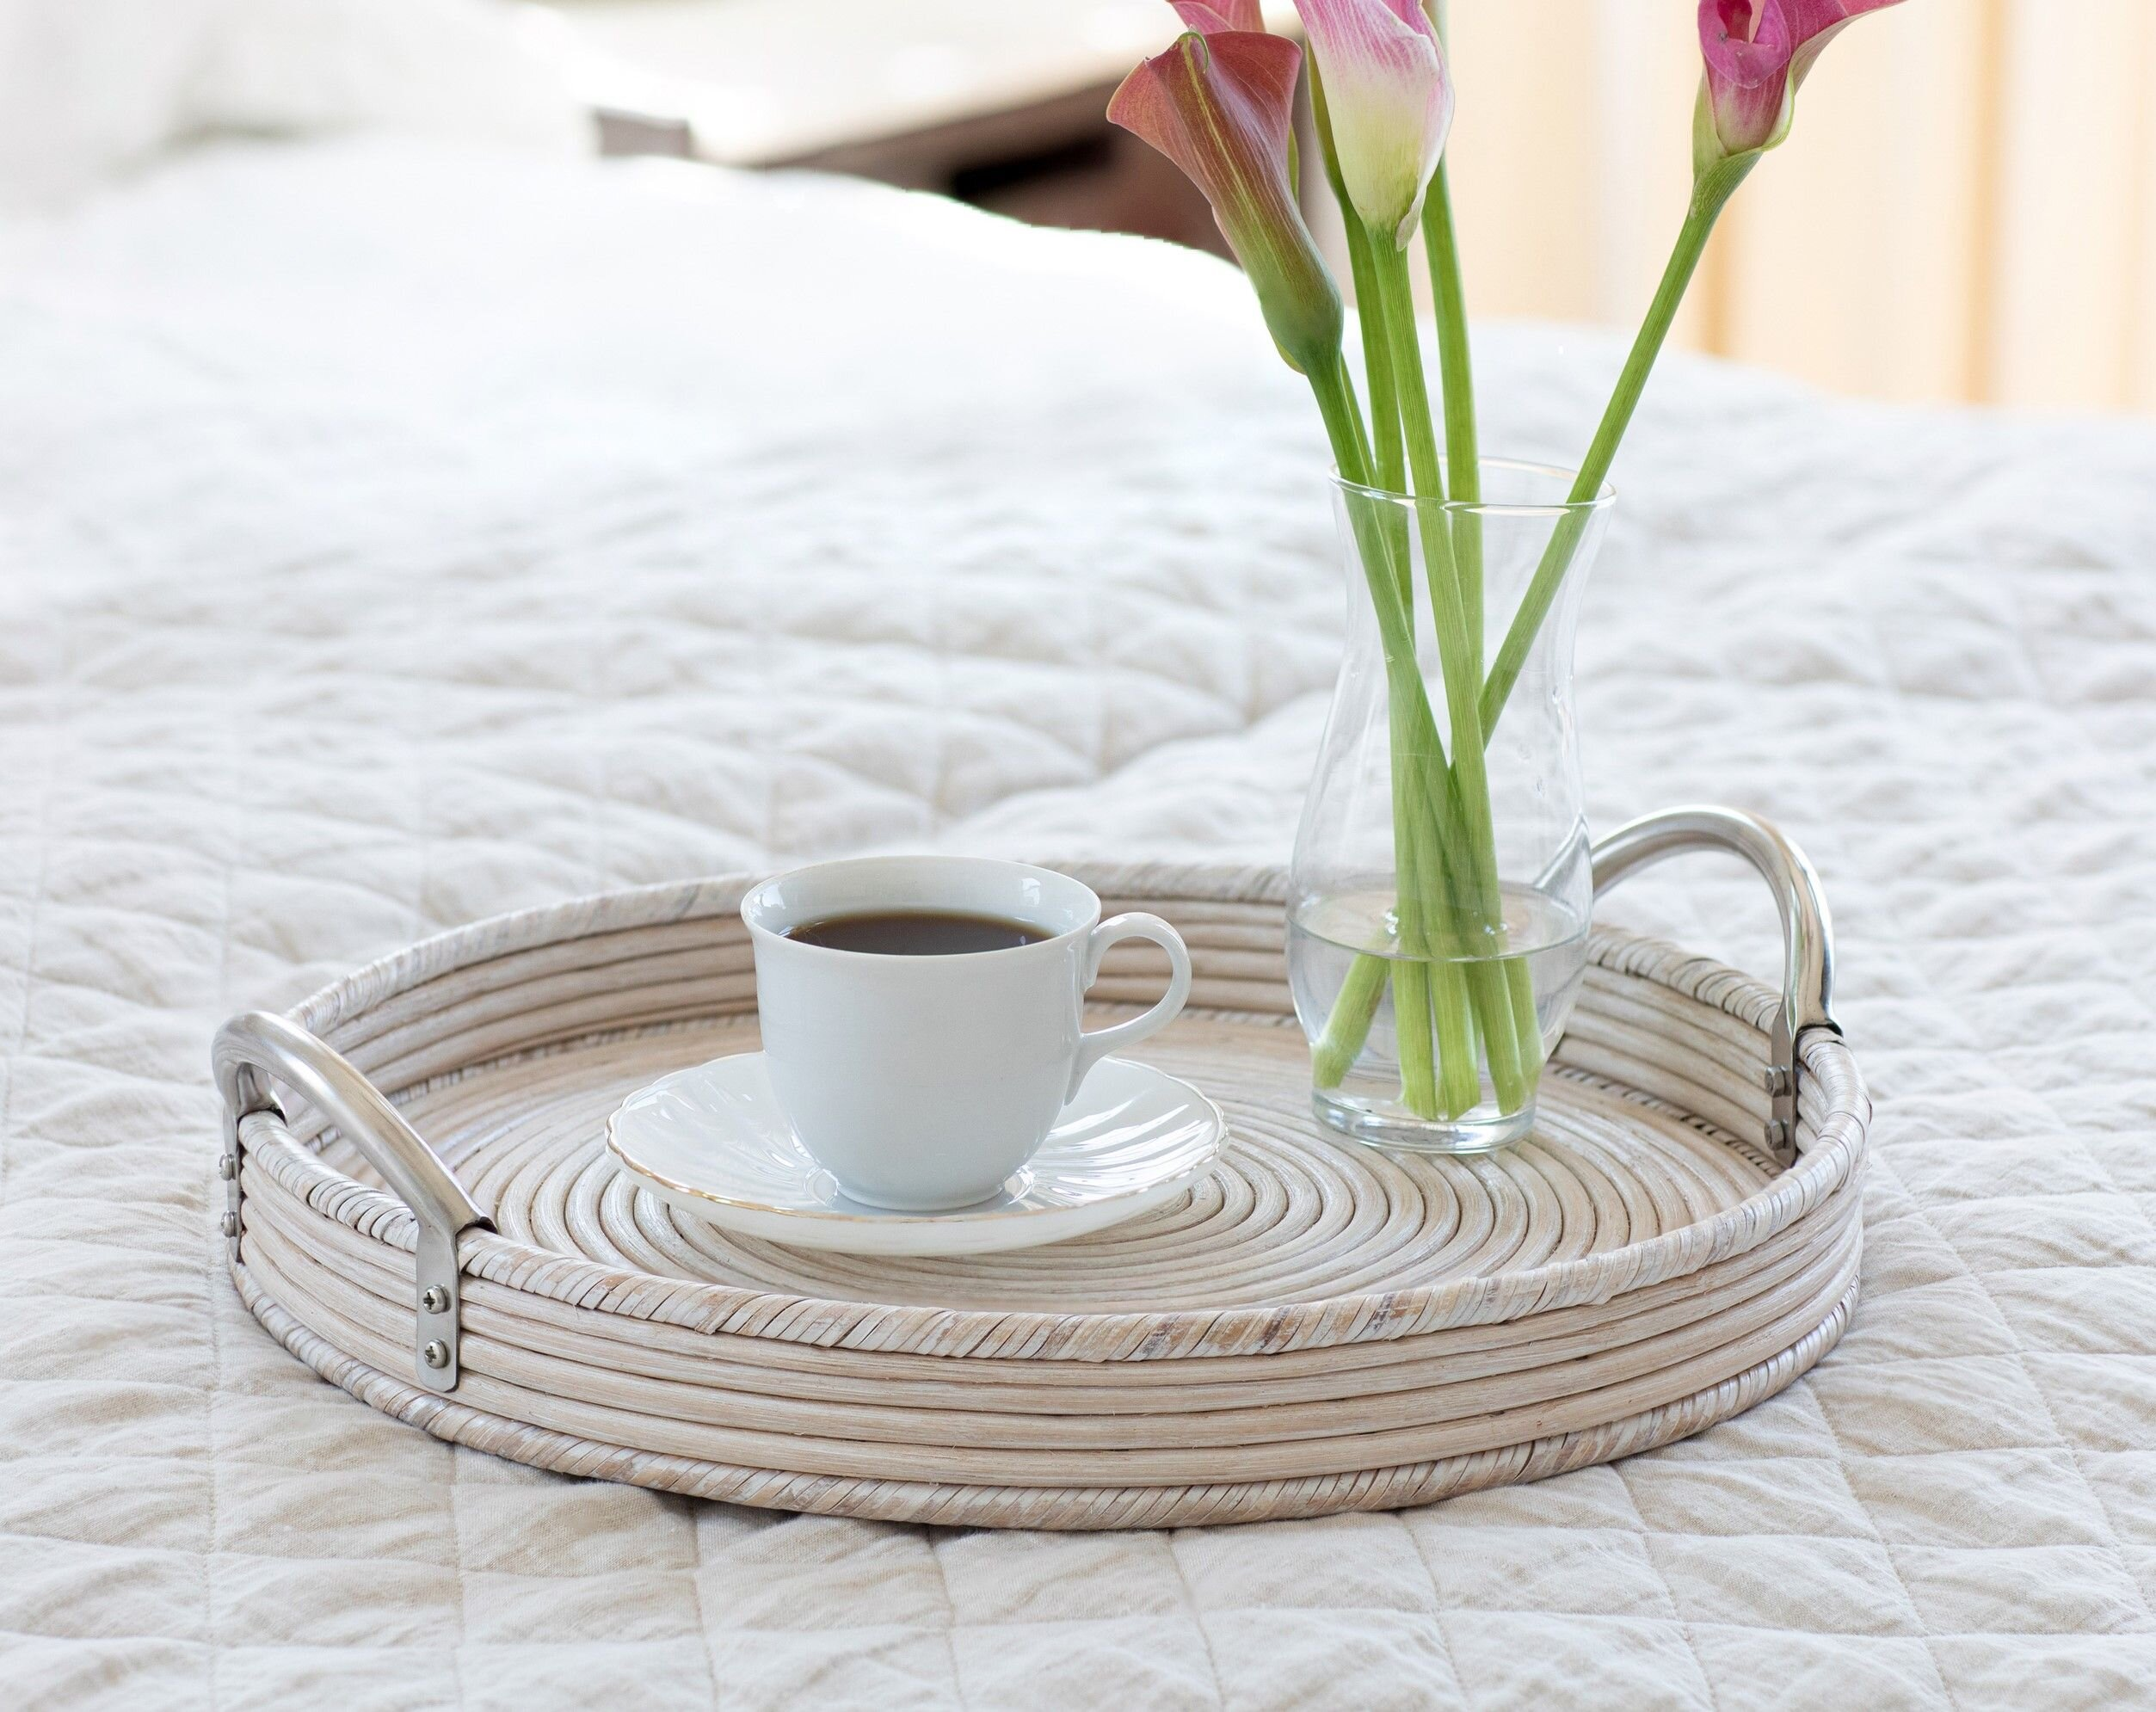 Highland Dunes Saboga Sattu Round With Stainless Steel Handles Ottoman Coffee Table Tray Reviews Wayfair